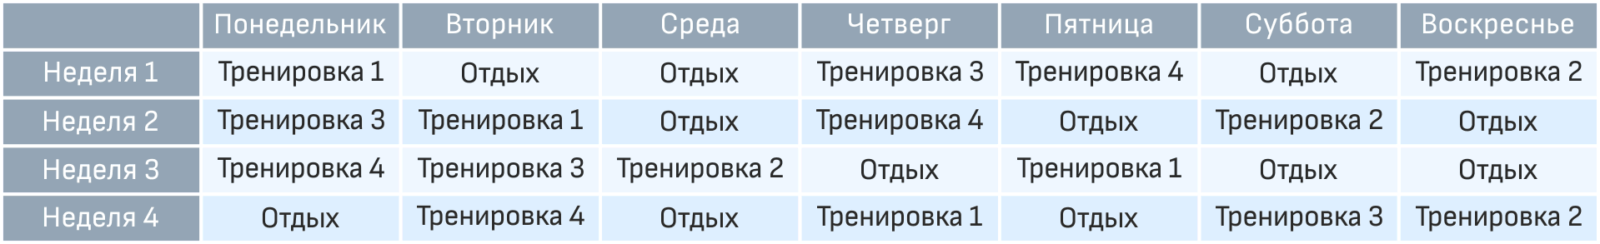 Вариант графика тренировок